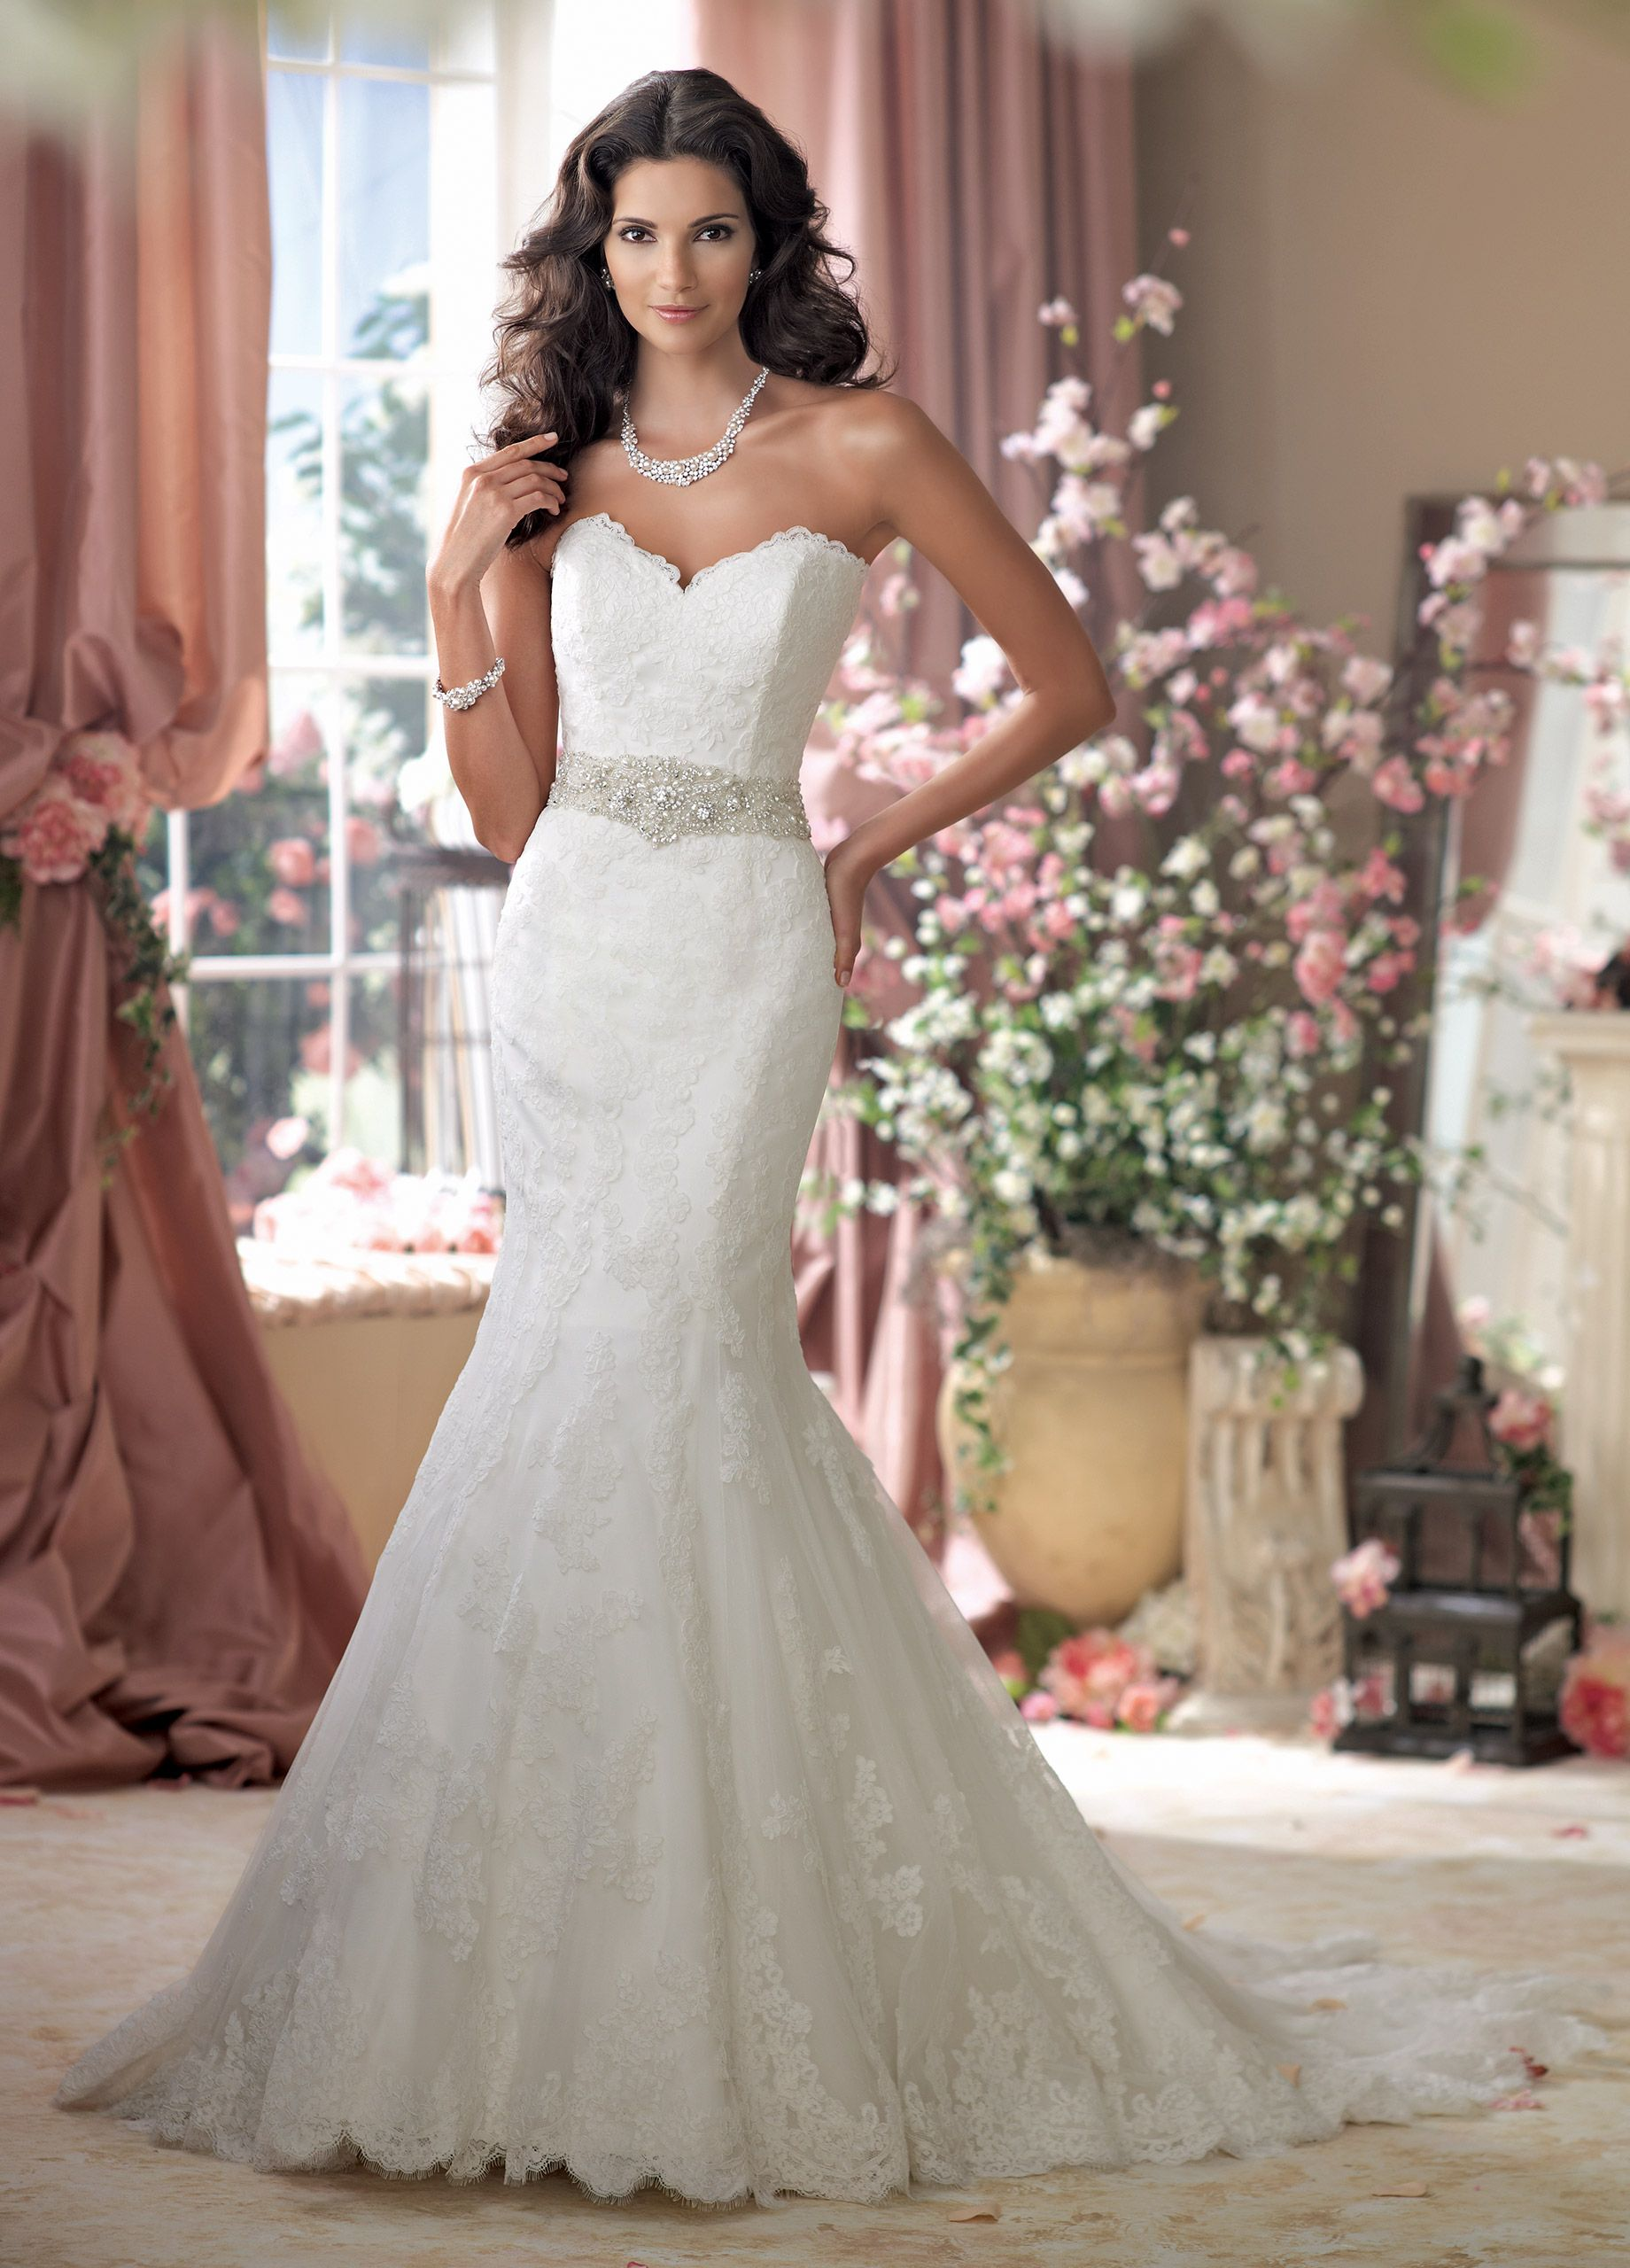 Pearl belt for wedding dress  Lace Mermaid With Beaded Belt Wedding Dress  MacClare